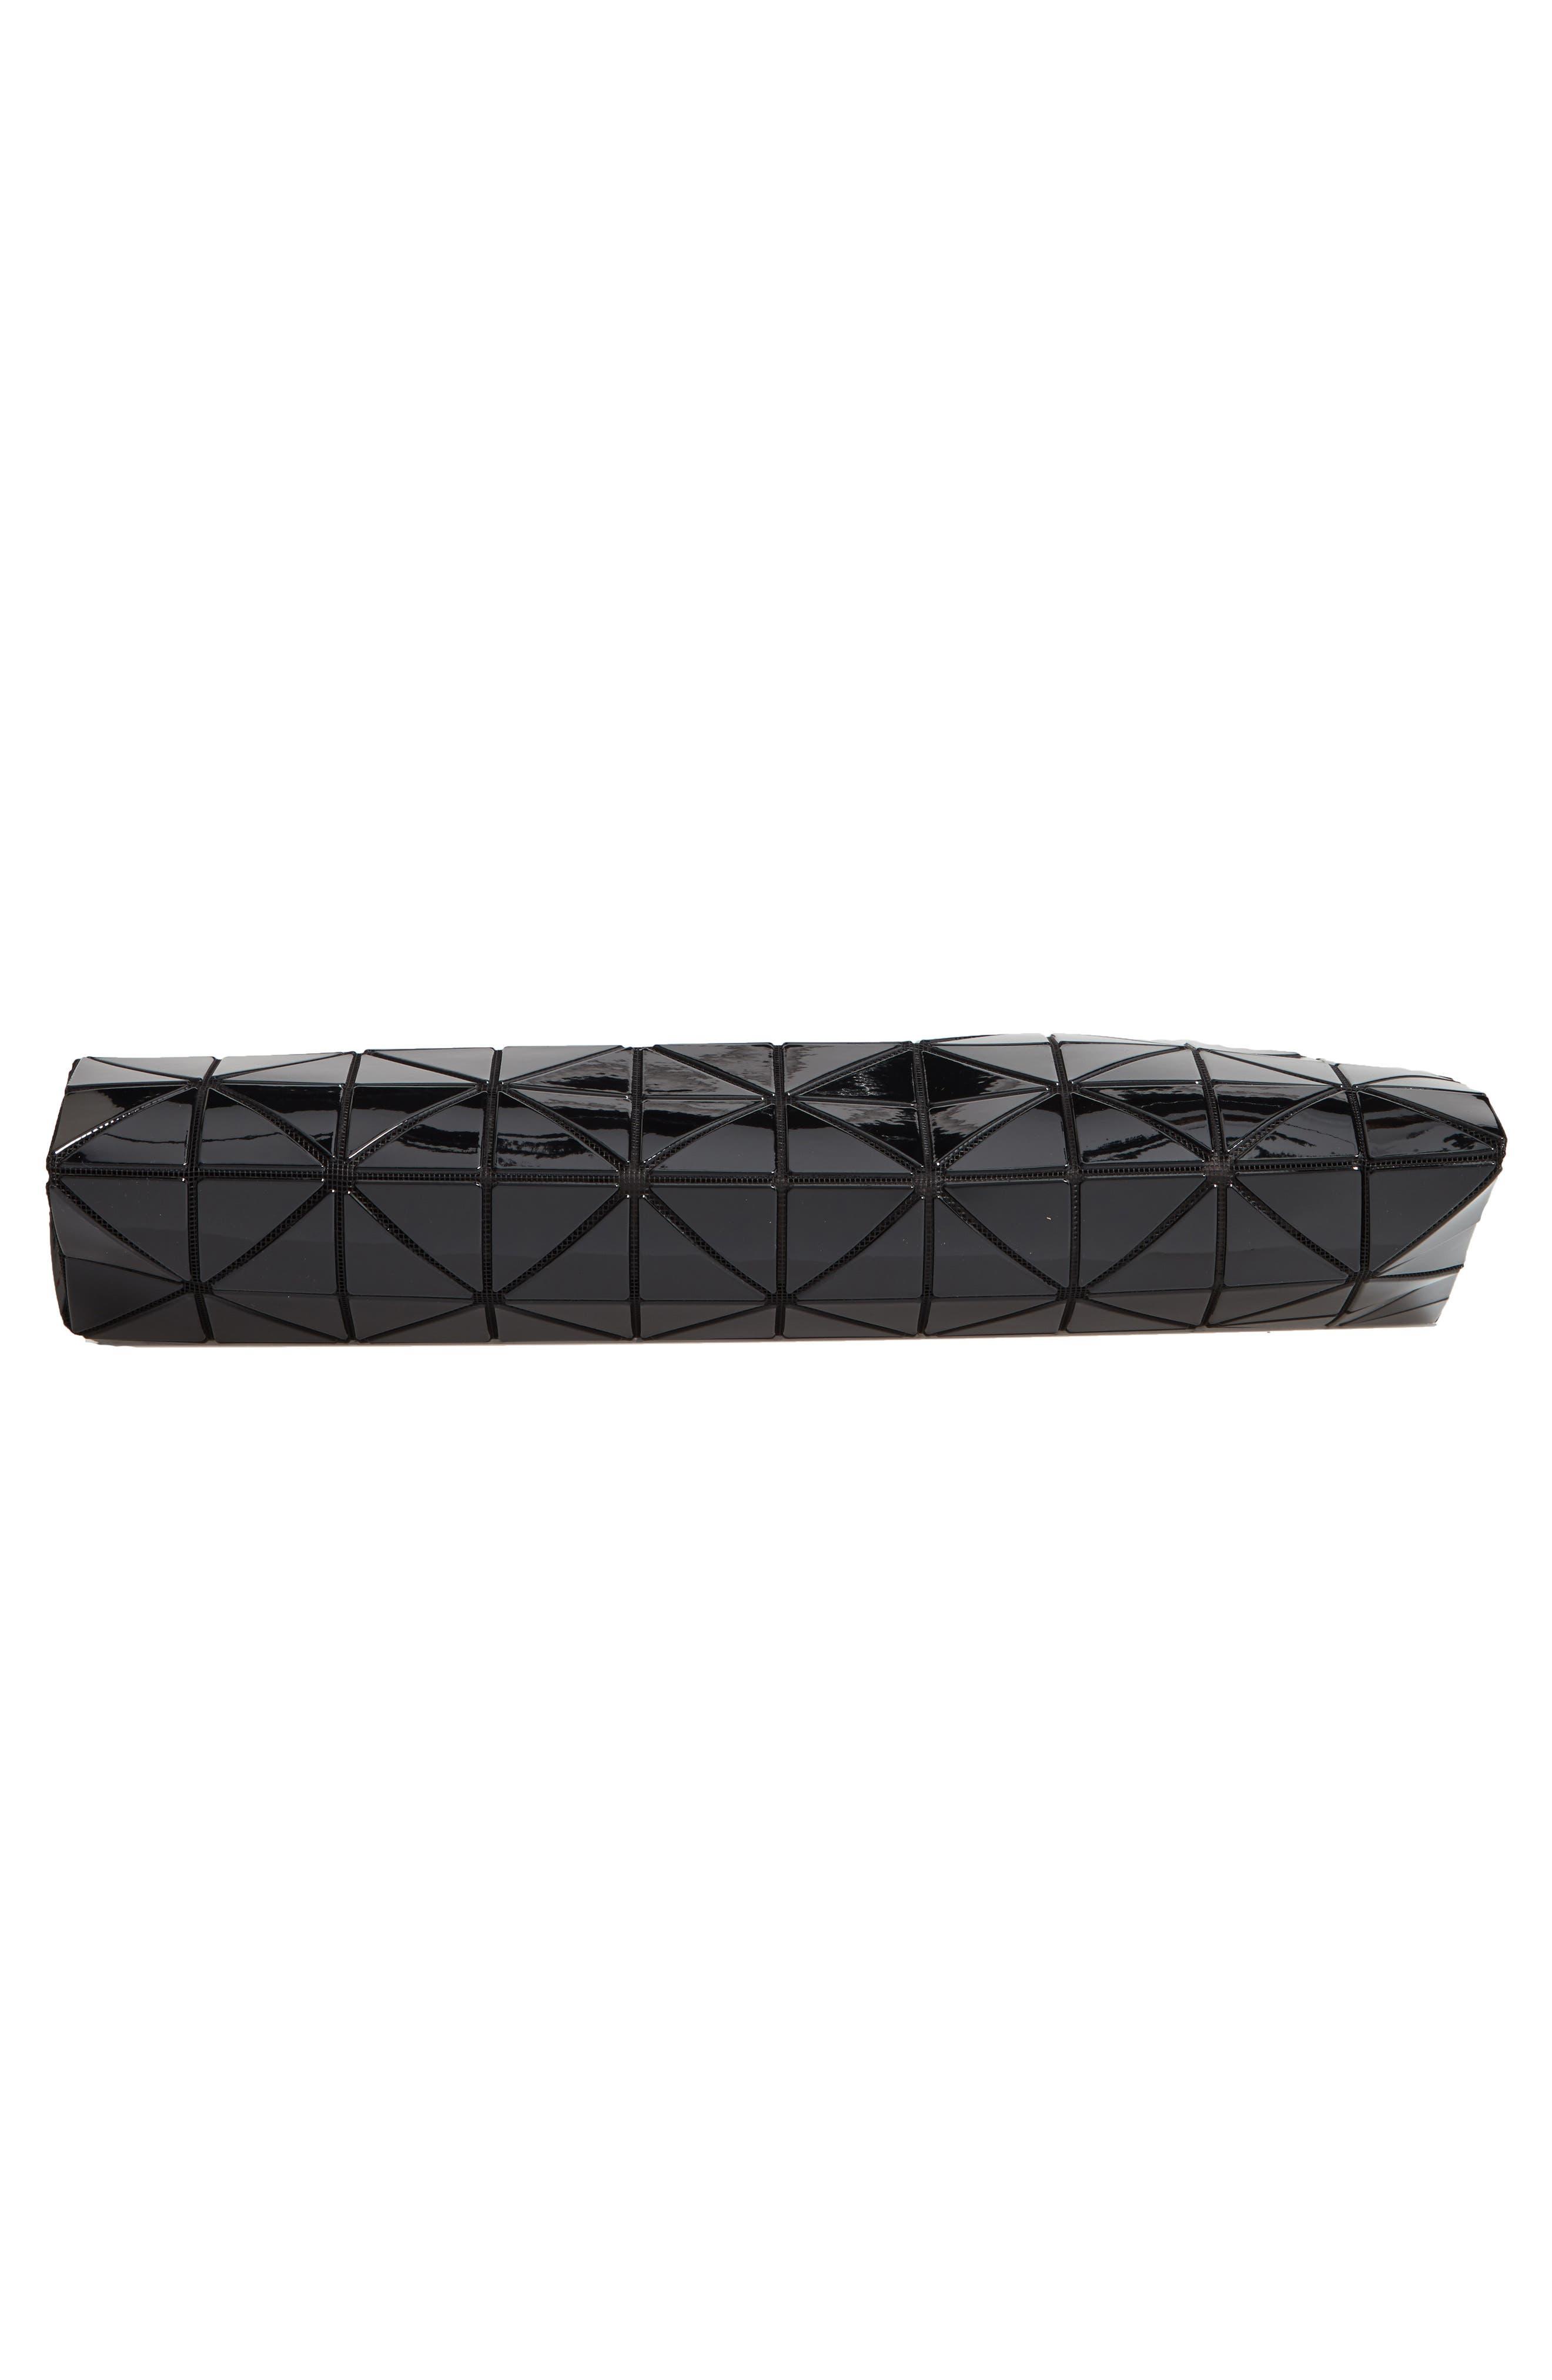 Carton Prism Tote Bag,                             Alternate thumbnail 6, color,                             BLACK